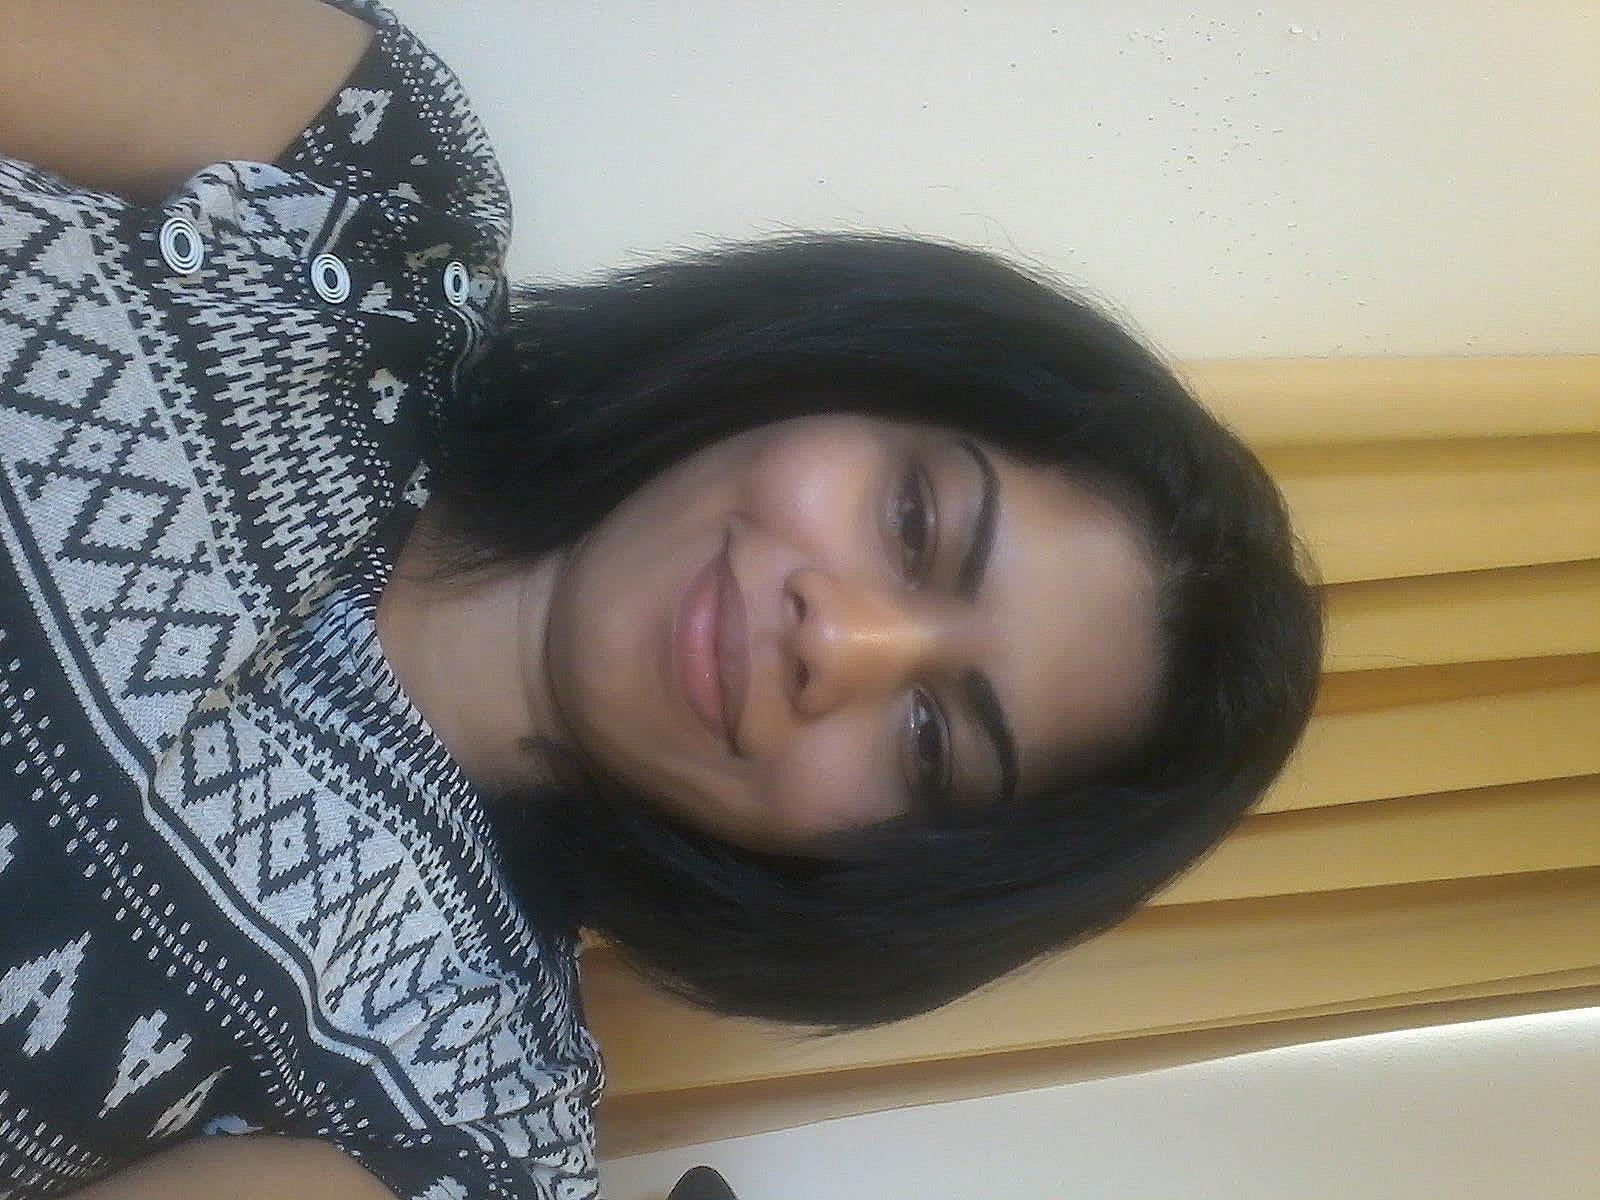 Ms. Dilhara Tutor